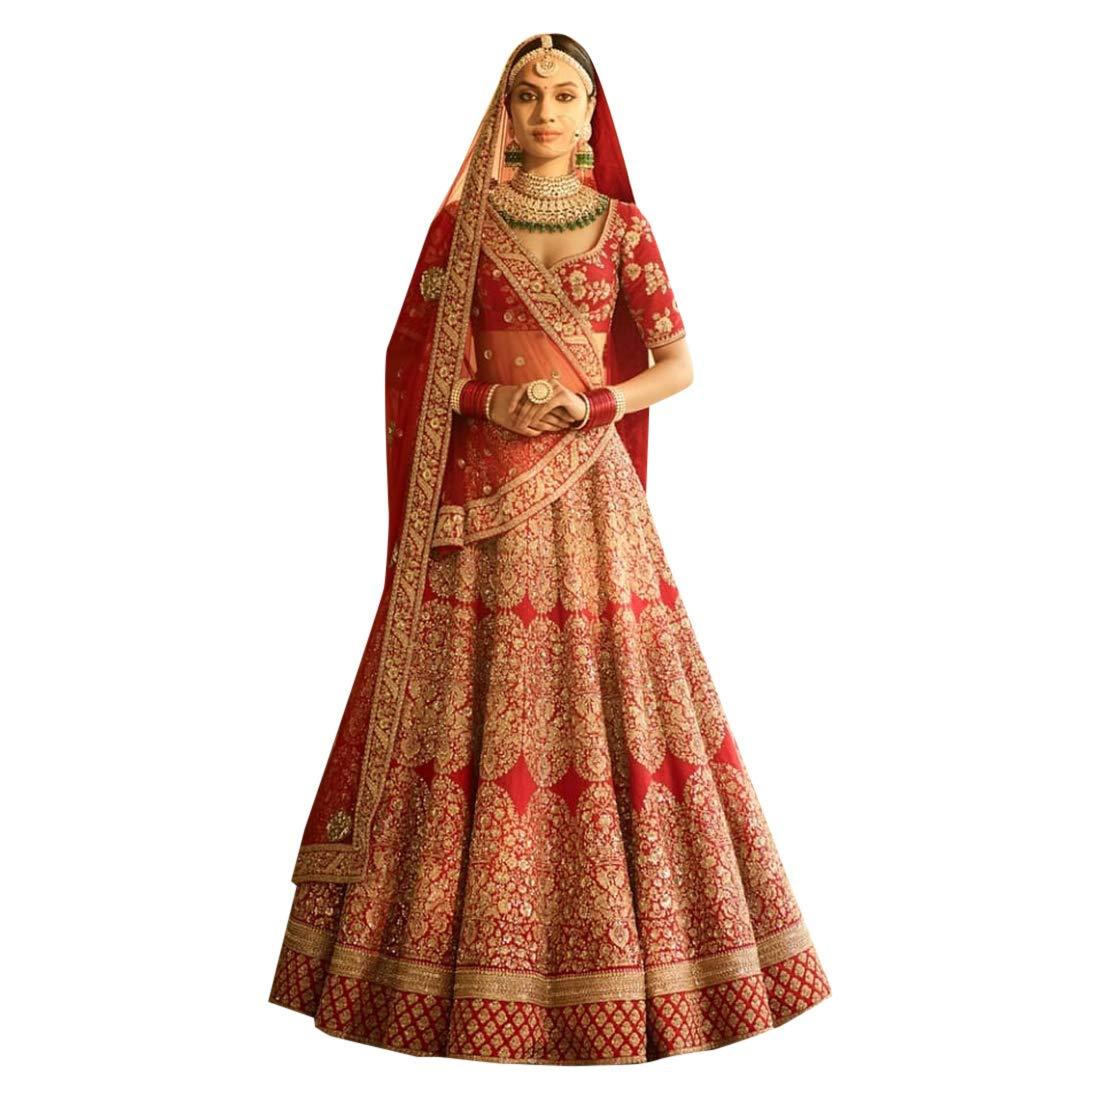 9cc161ef5073f0 Amazon.com: Red Bridal Designer Royal 2 Dupatta Wedding Festive Chennai  Silk Lehenga Choli Ghagra Dupatta Indian Muslim Zari Bespoke BP: Home  Improvement